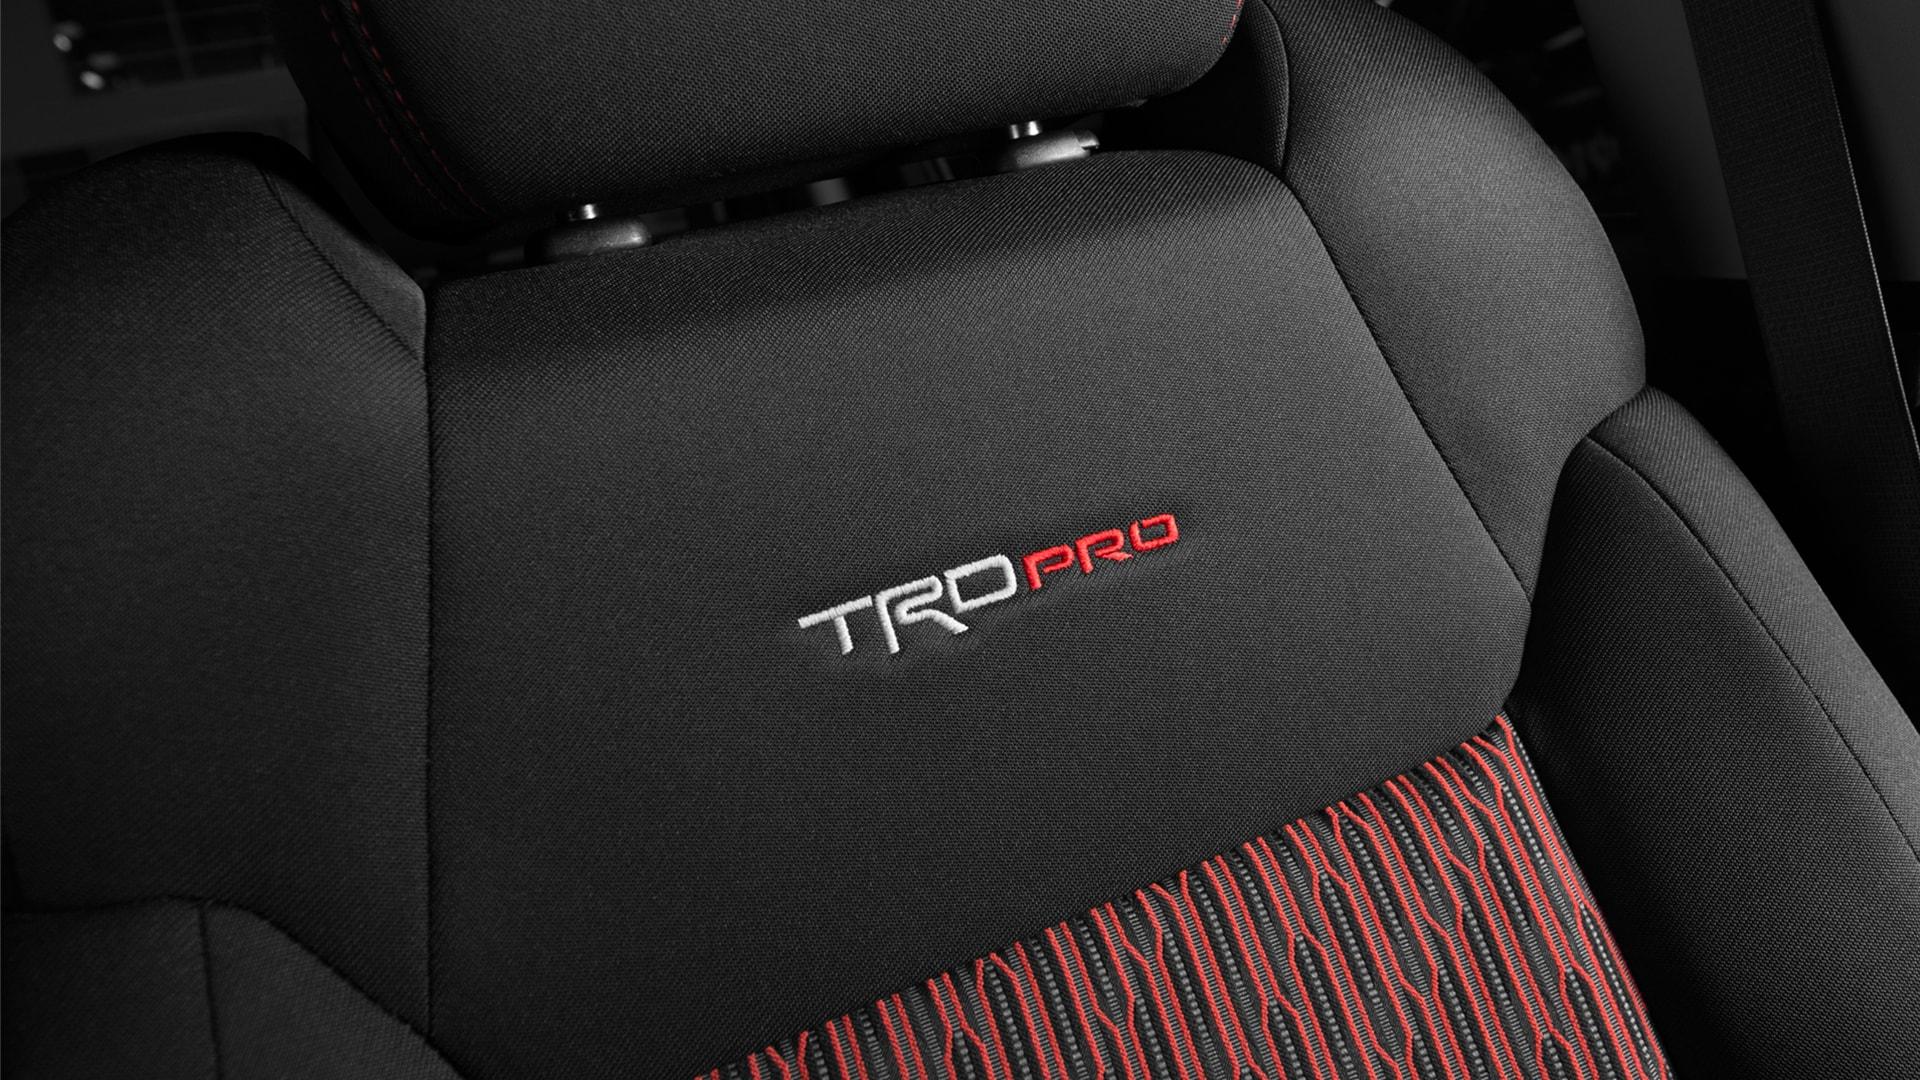 TRD Pro 4Runner, Tundra, and Tacoma in Arkansas | Steve Landers Toyota ...